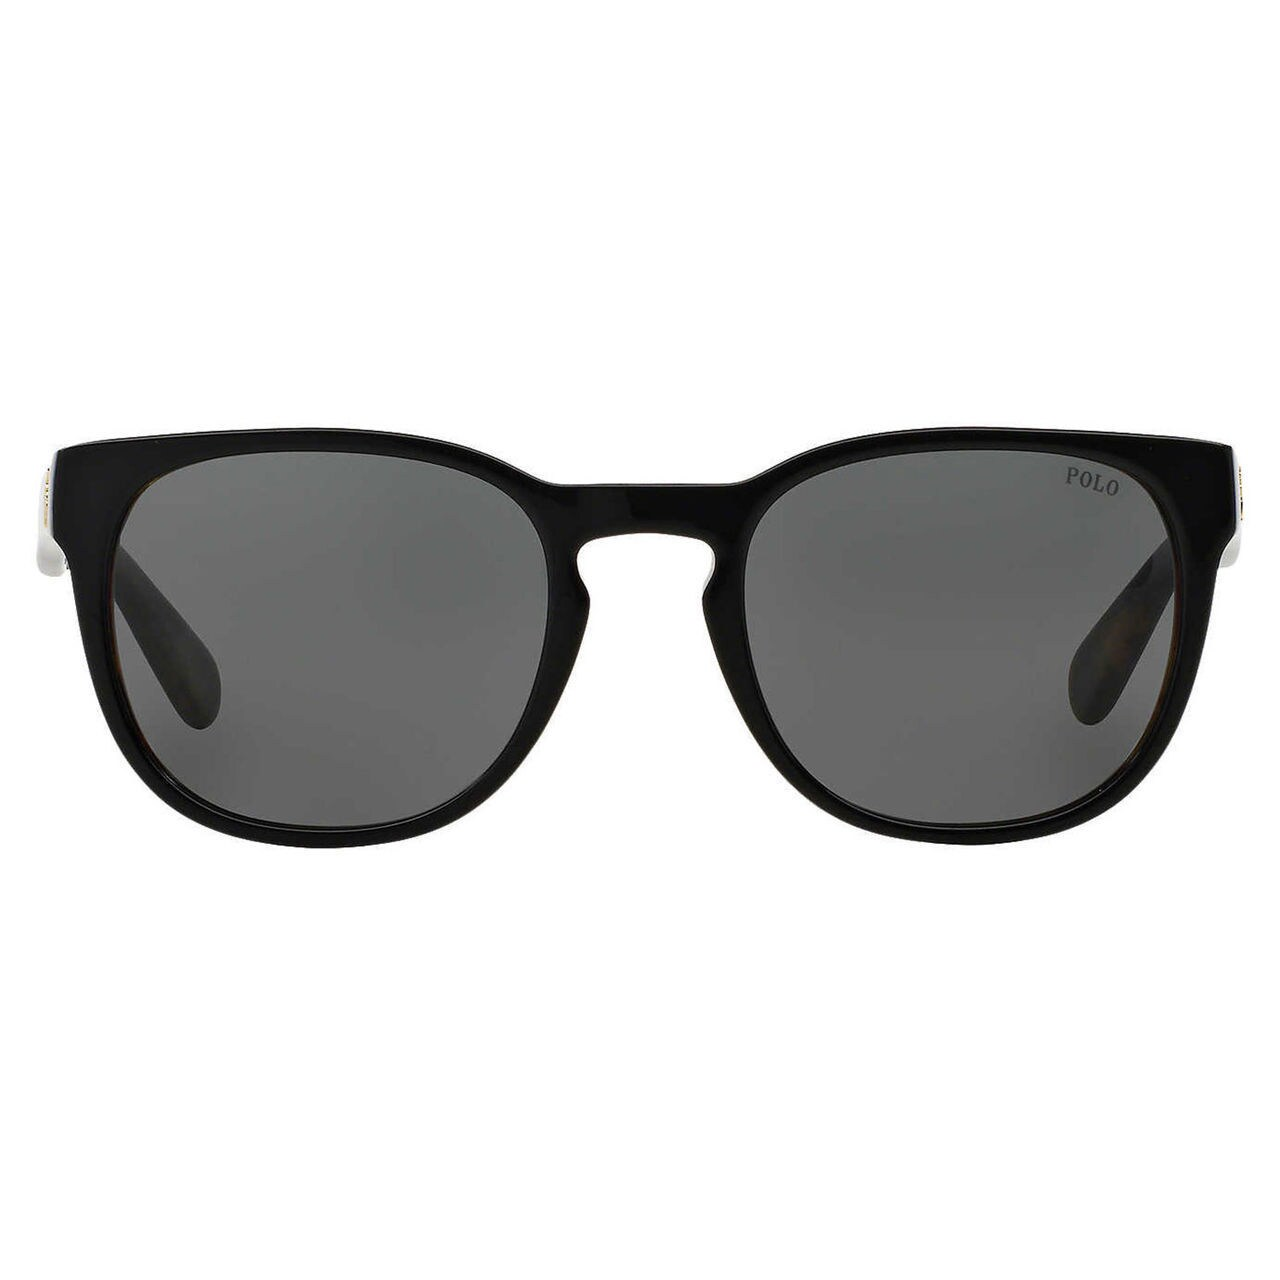 ad15435e00 Shop Polo Ralph Lauren Men s PH4099 Plastic Phantos Sunglasses - Black -  Large - Free Shipping Today - Overstock.com - 10440284